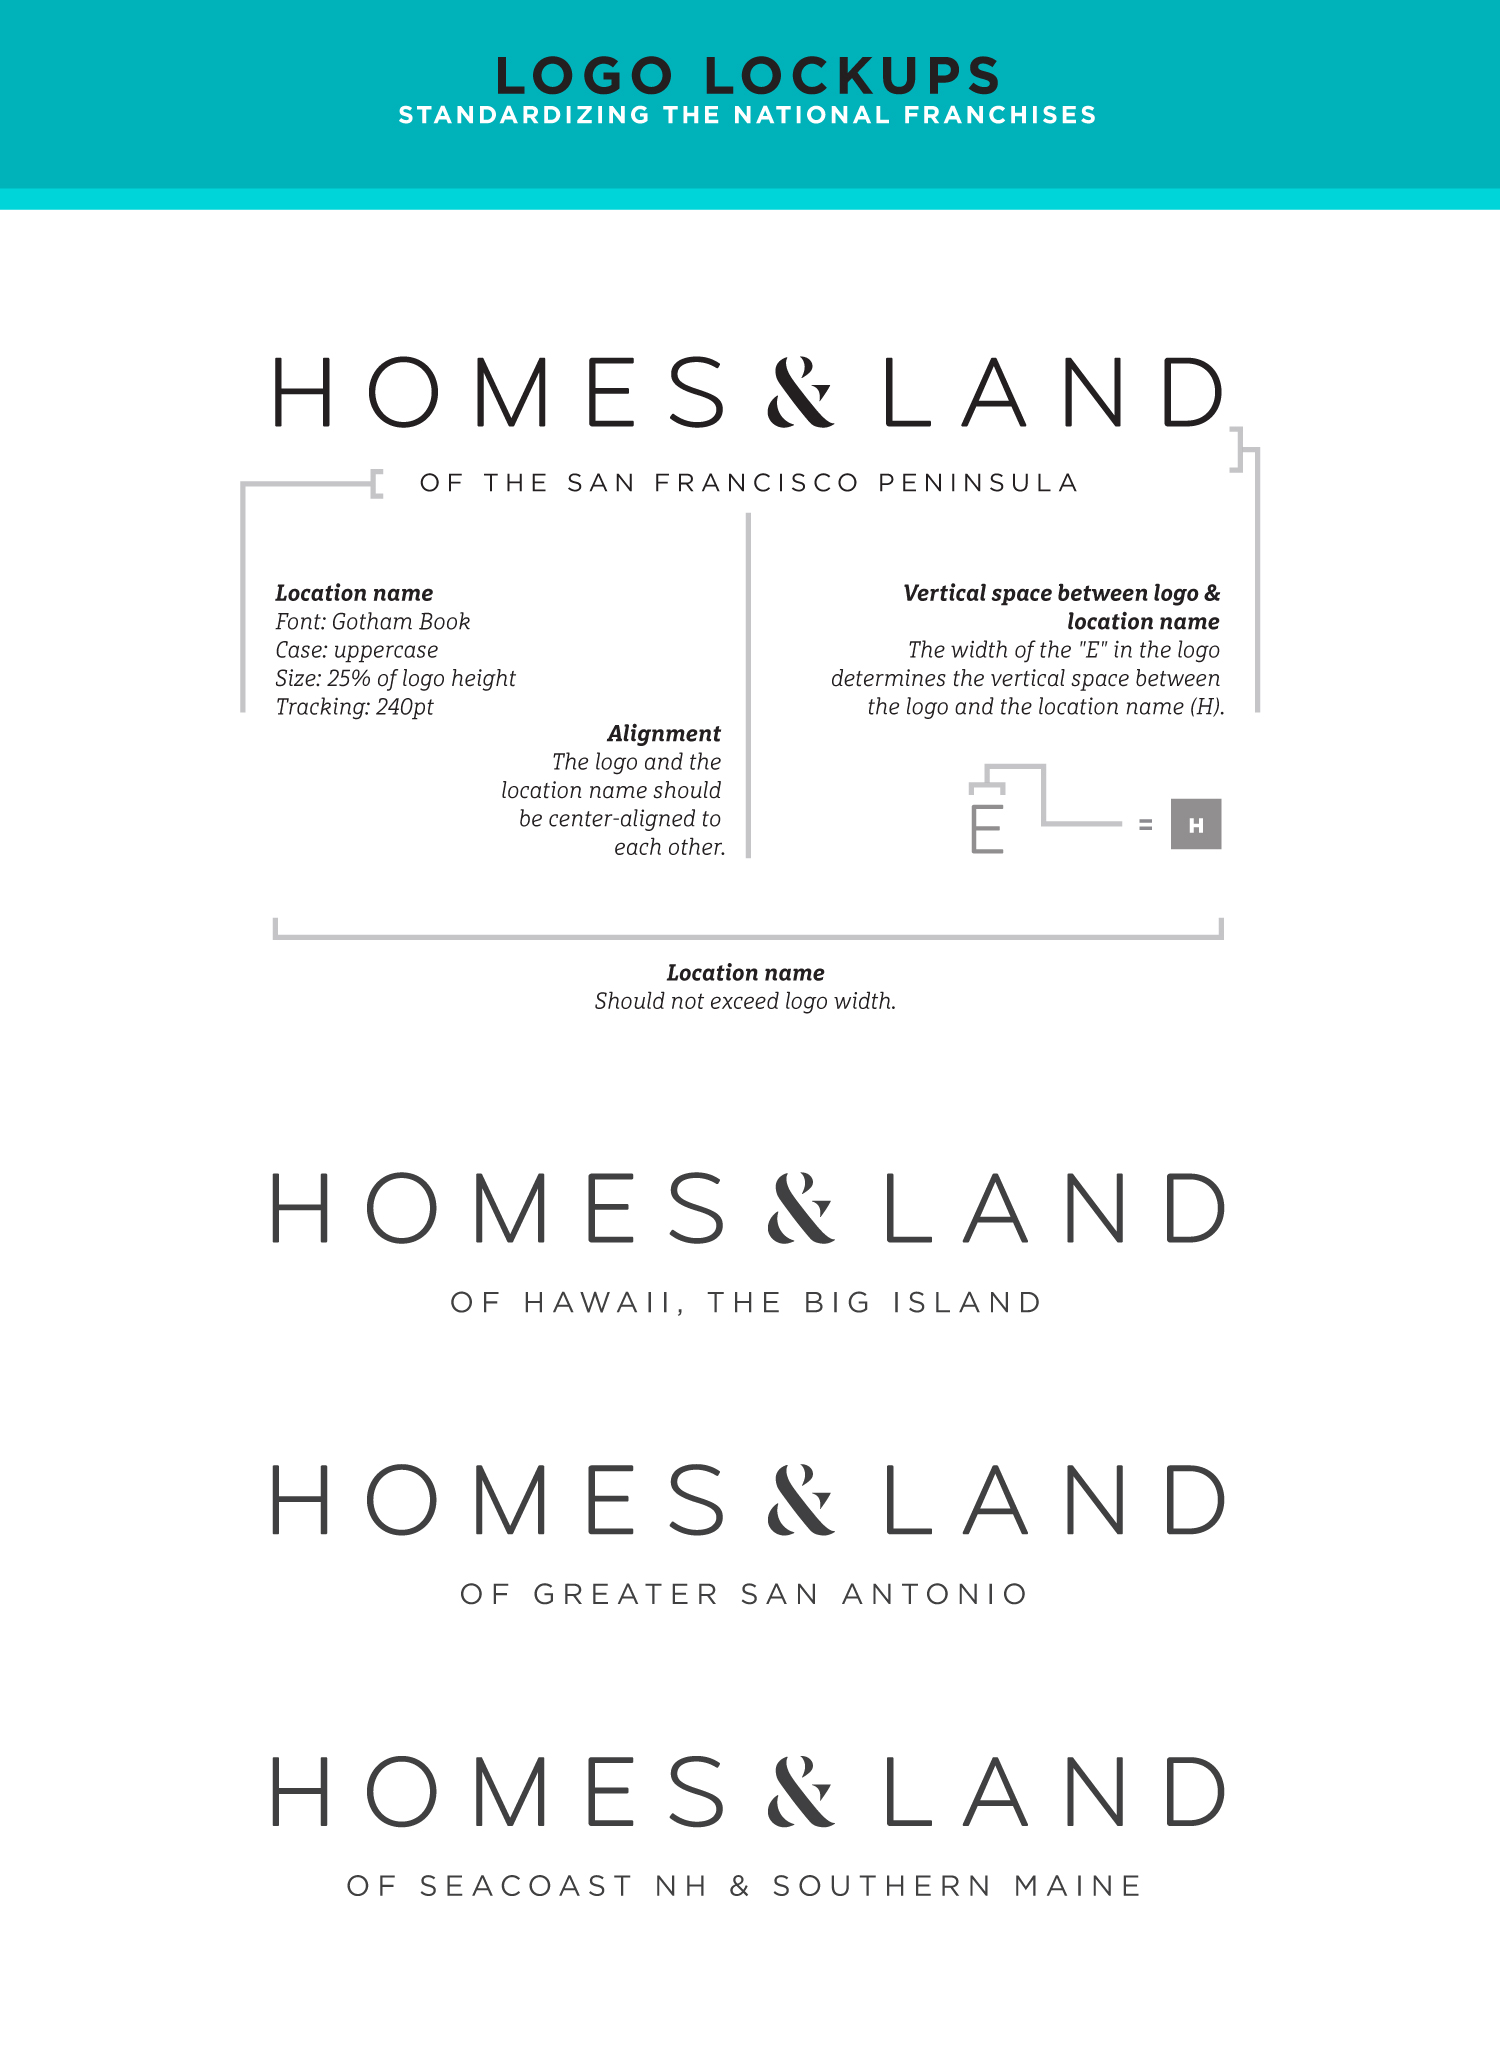 HomesLand_Lockups.jpg